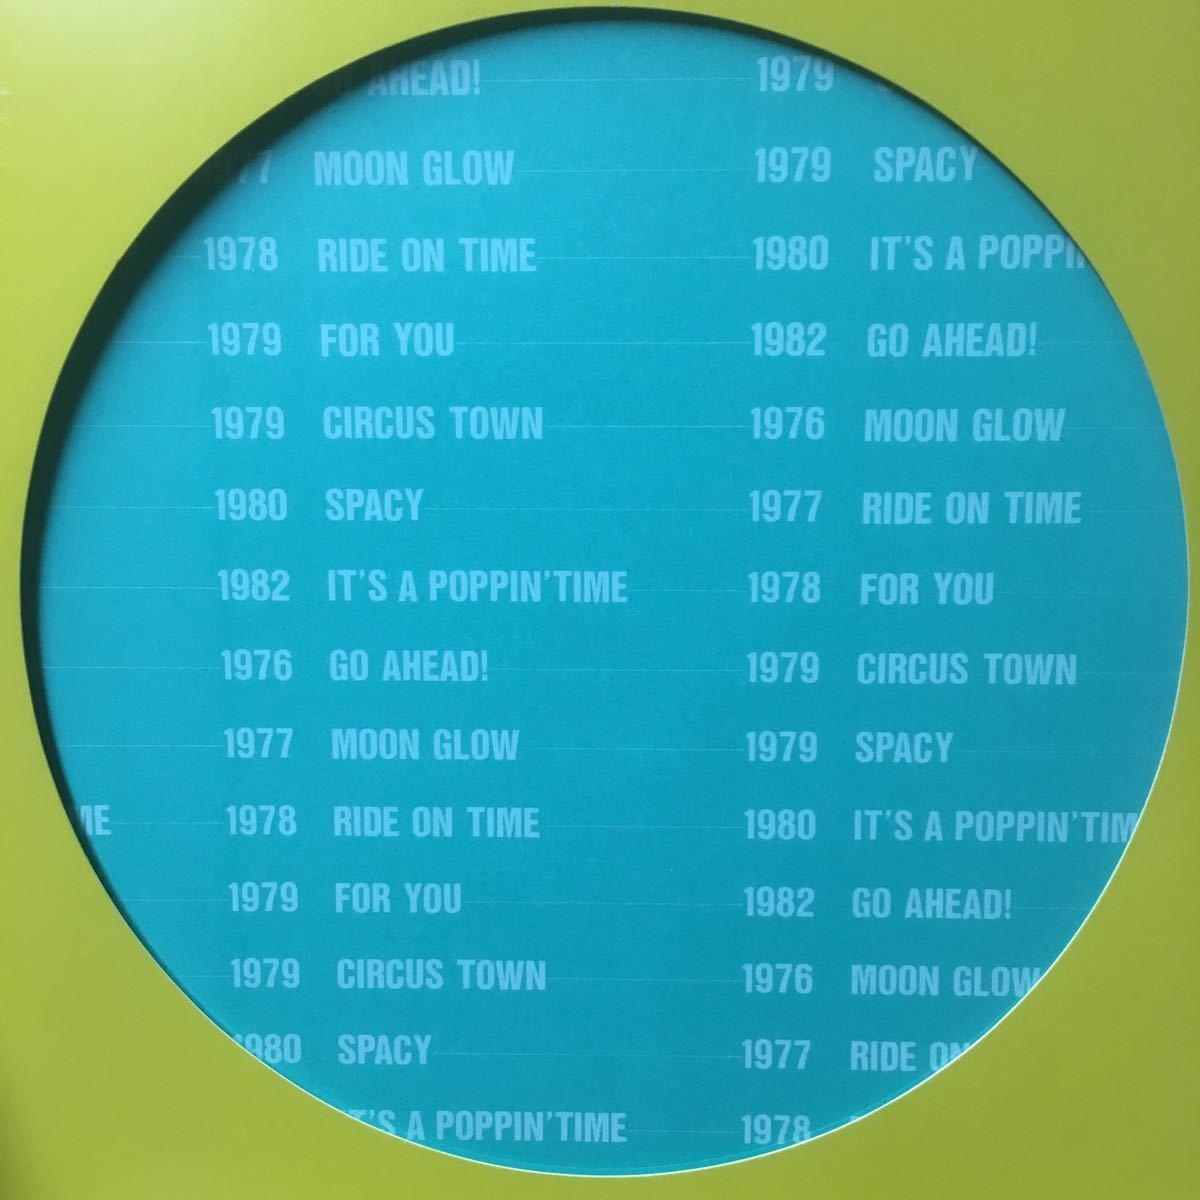 DJ COPY★山下達郎/9 MINUTES OF TATSURO YAMASHITA 限定700枚 ピクチャー・レコード SJLD-1087_画像3